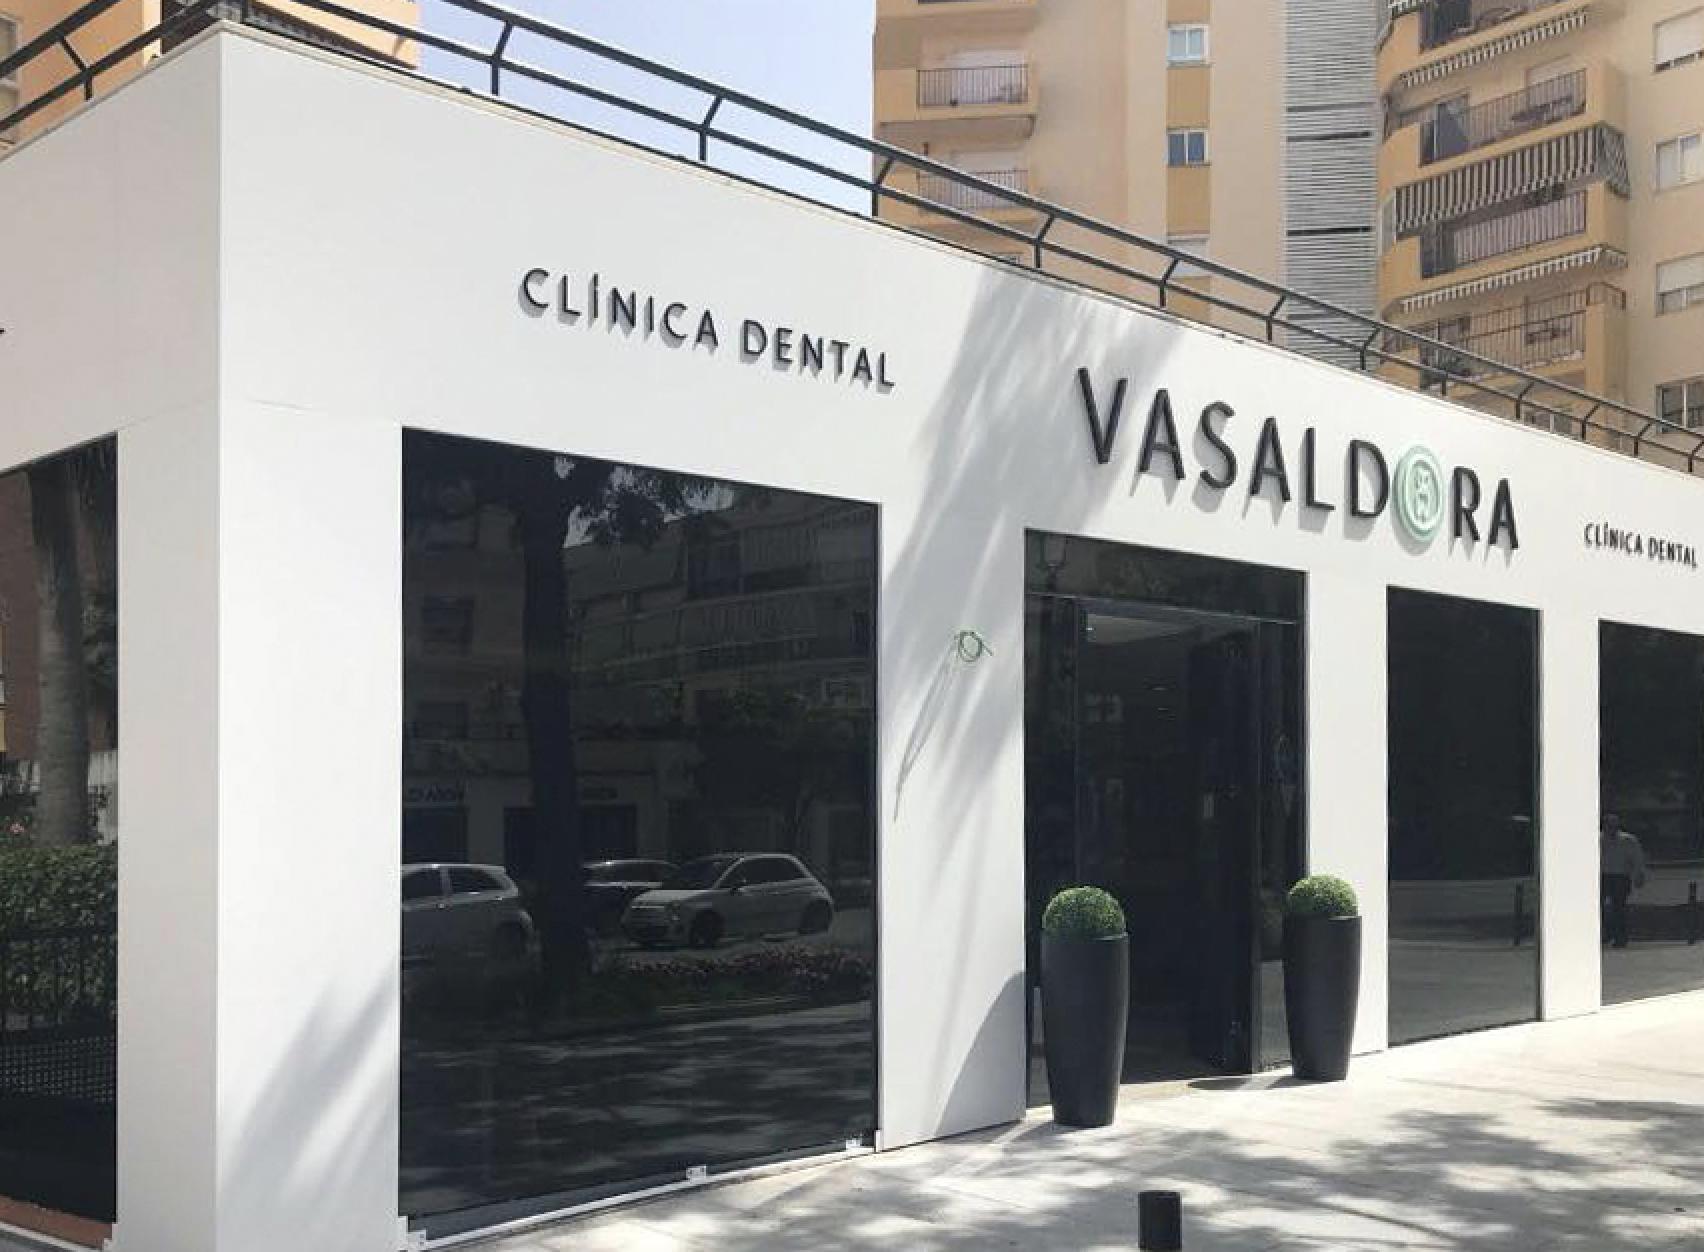 vasaldora3_lamadredelosbeatles